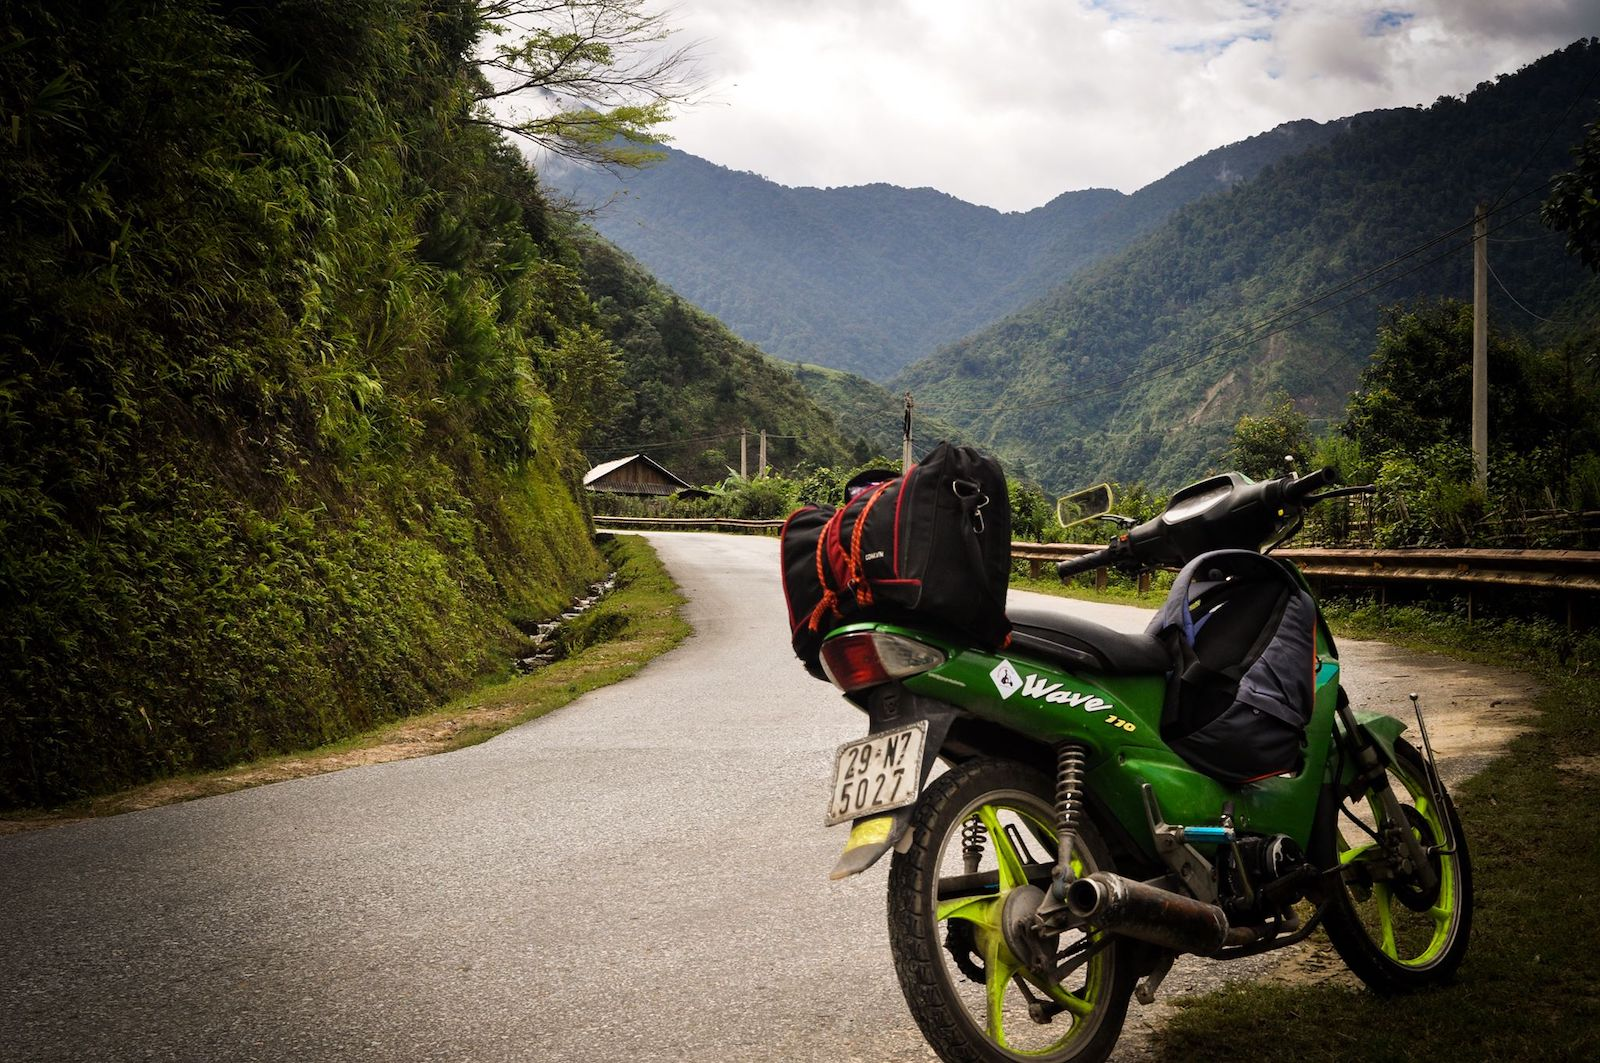 Image of a Wave motorbike in Vietnam from RentabikeVN